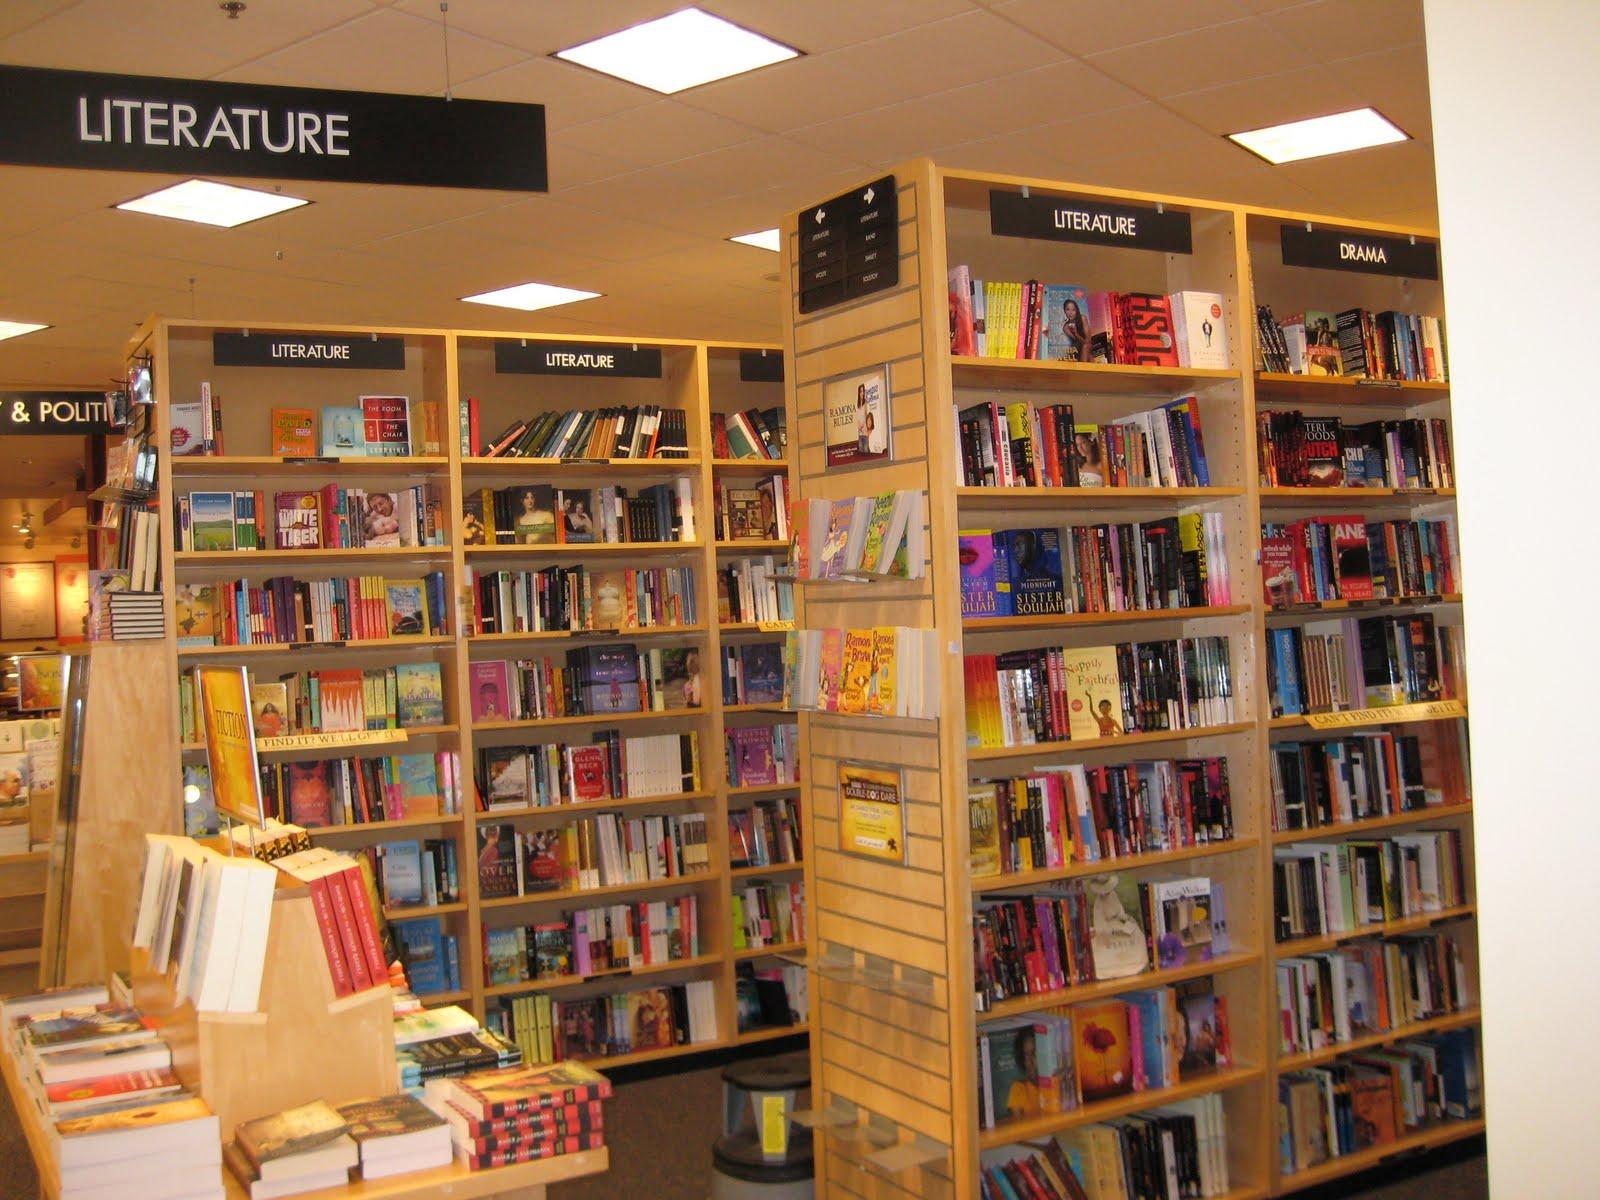 Lena Amp Familylife Inside Borders Bookstore